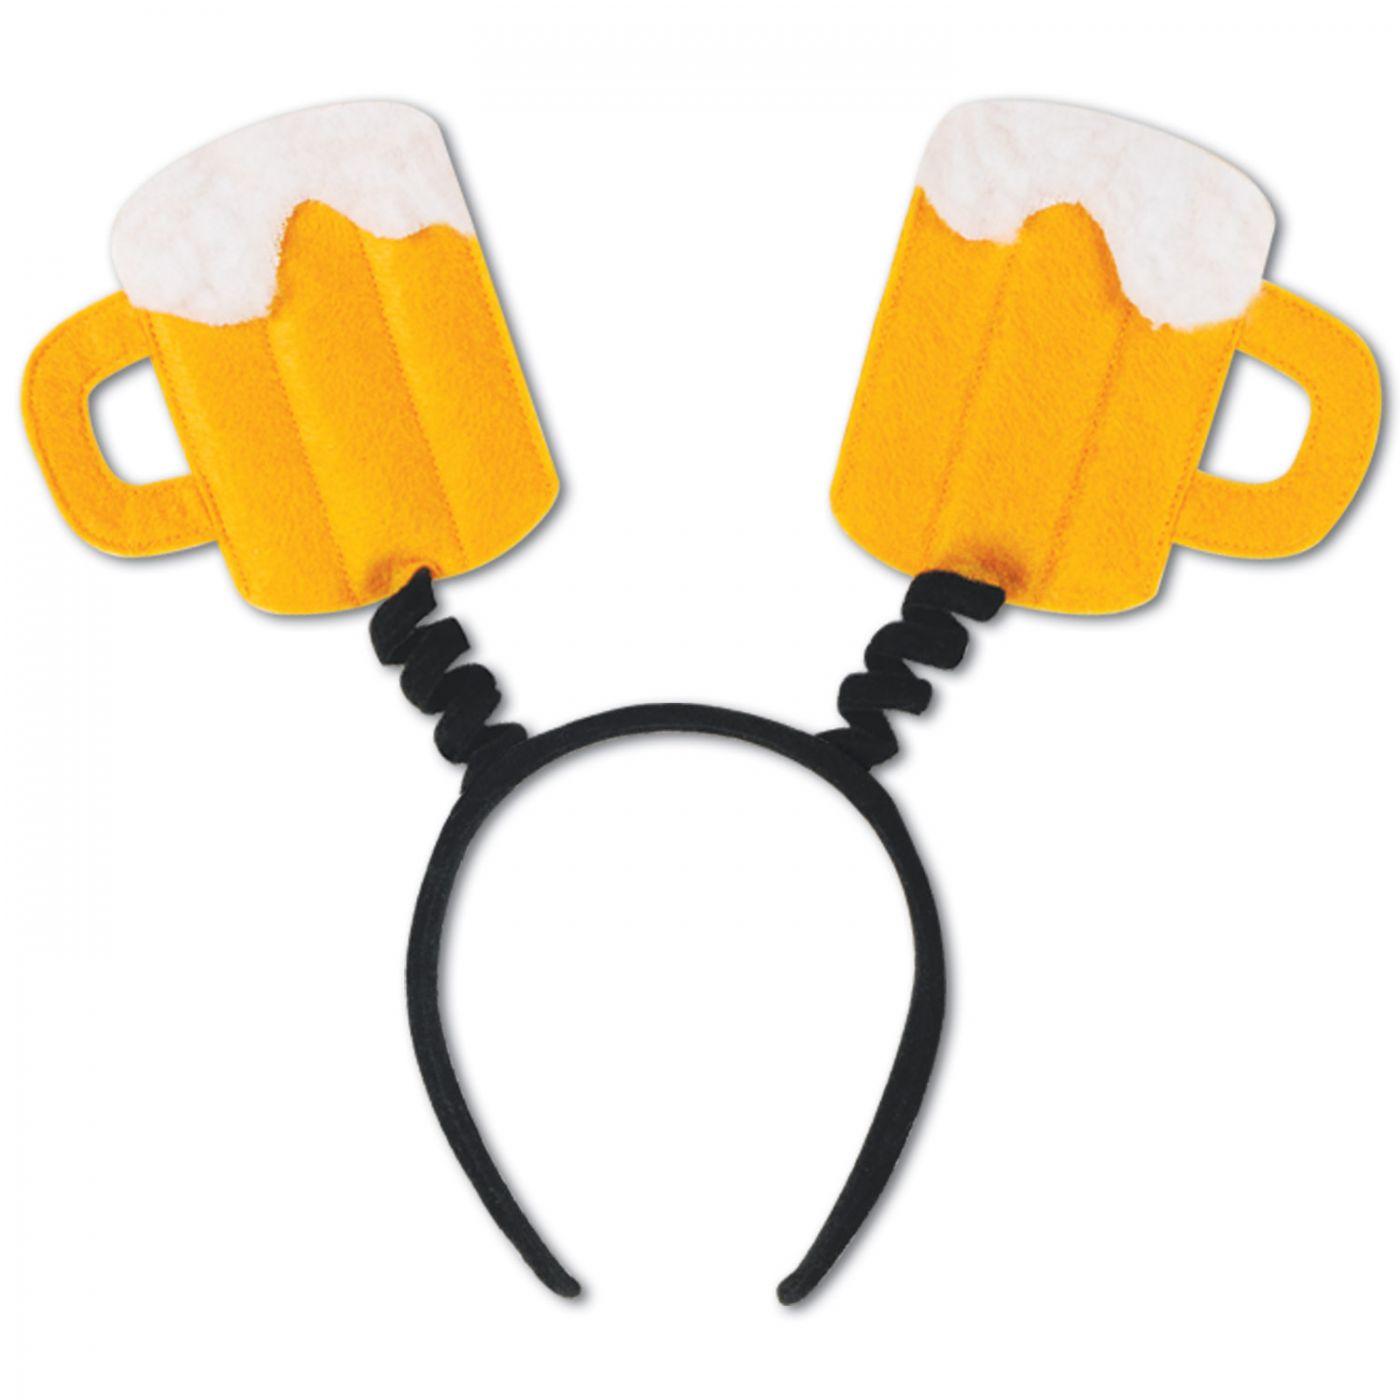 Image of Beer Mug Boppers